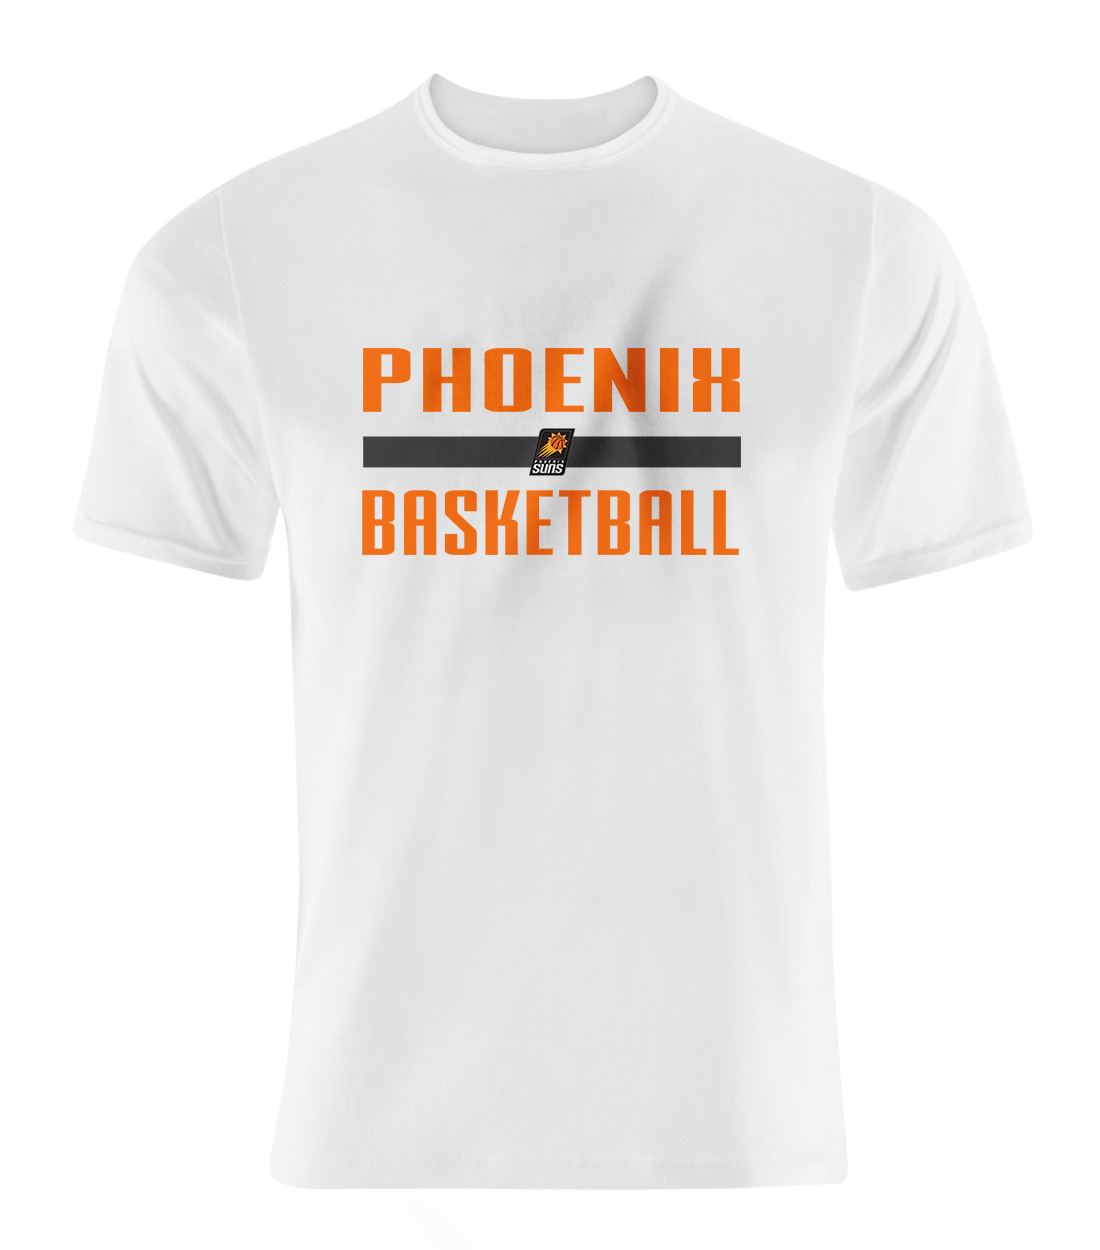 Phoneix Suns Basketball Tshirt (TSH-WHT-NP-Phoneix-bsktball-535)